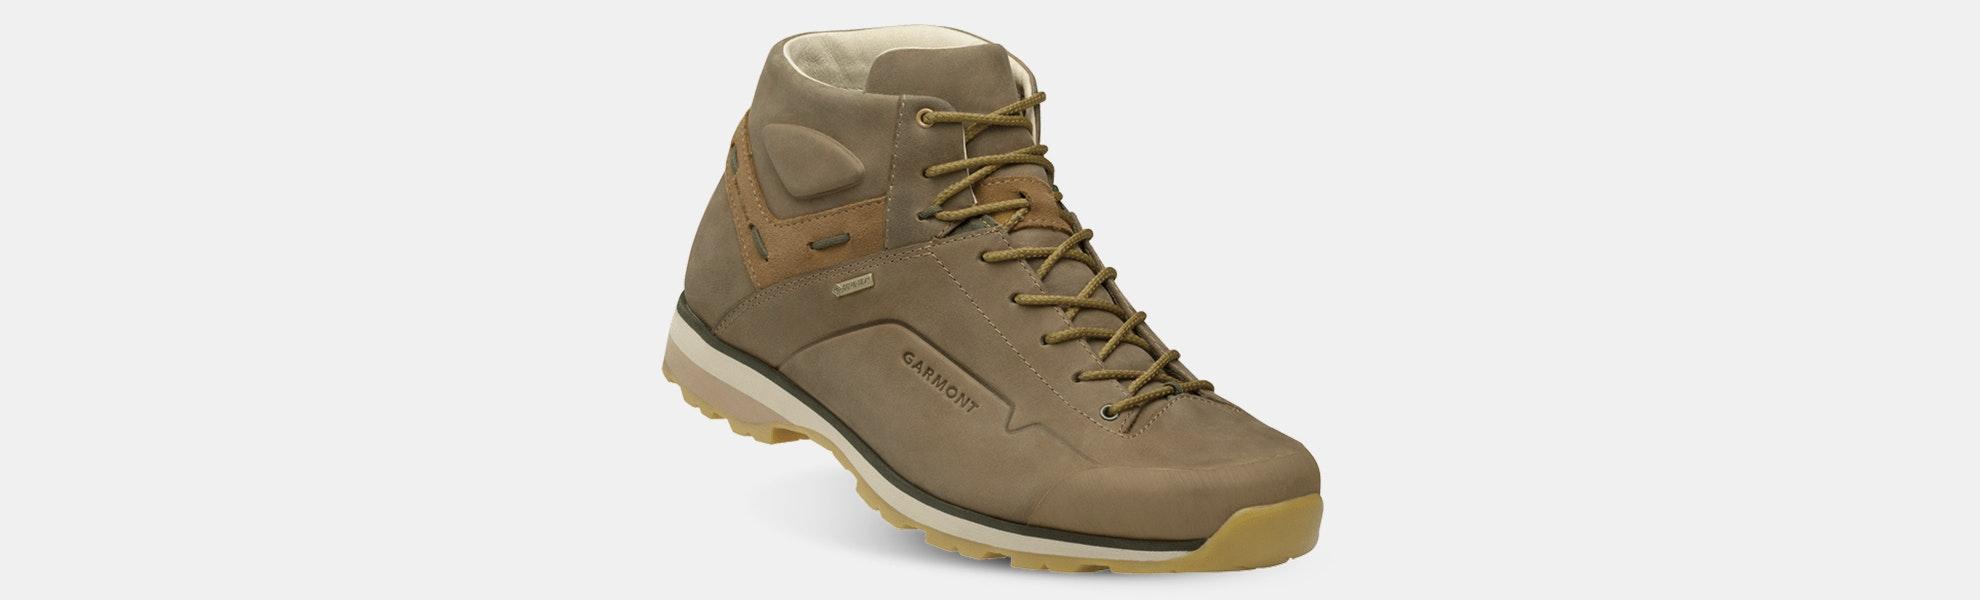 Garmont Miguasha GTX Mid Nubuck Boots